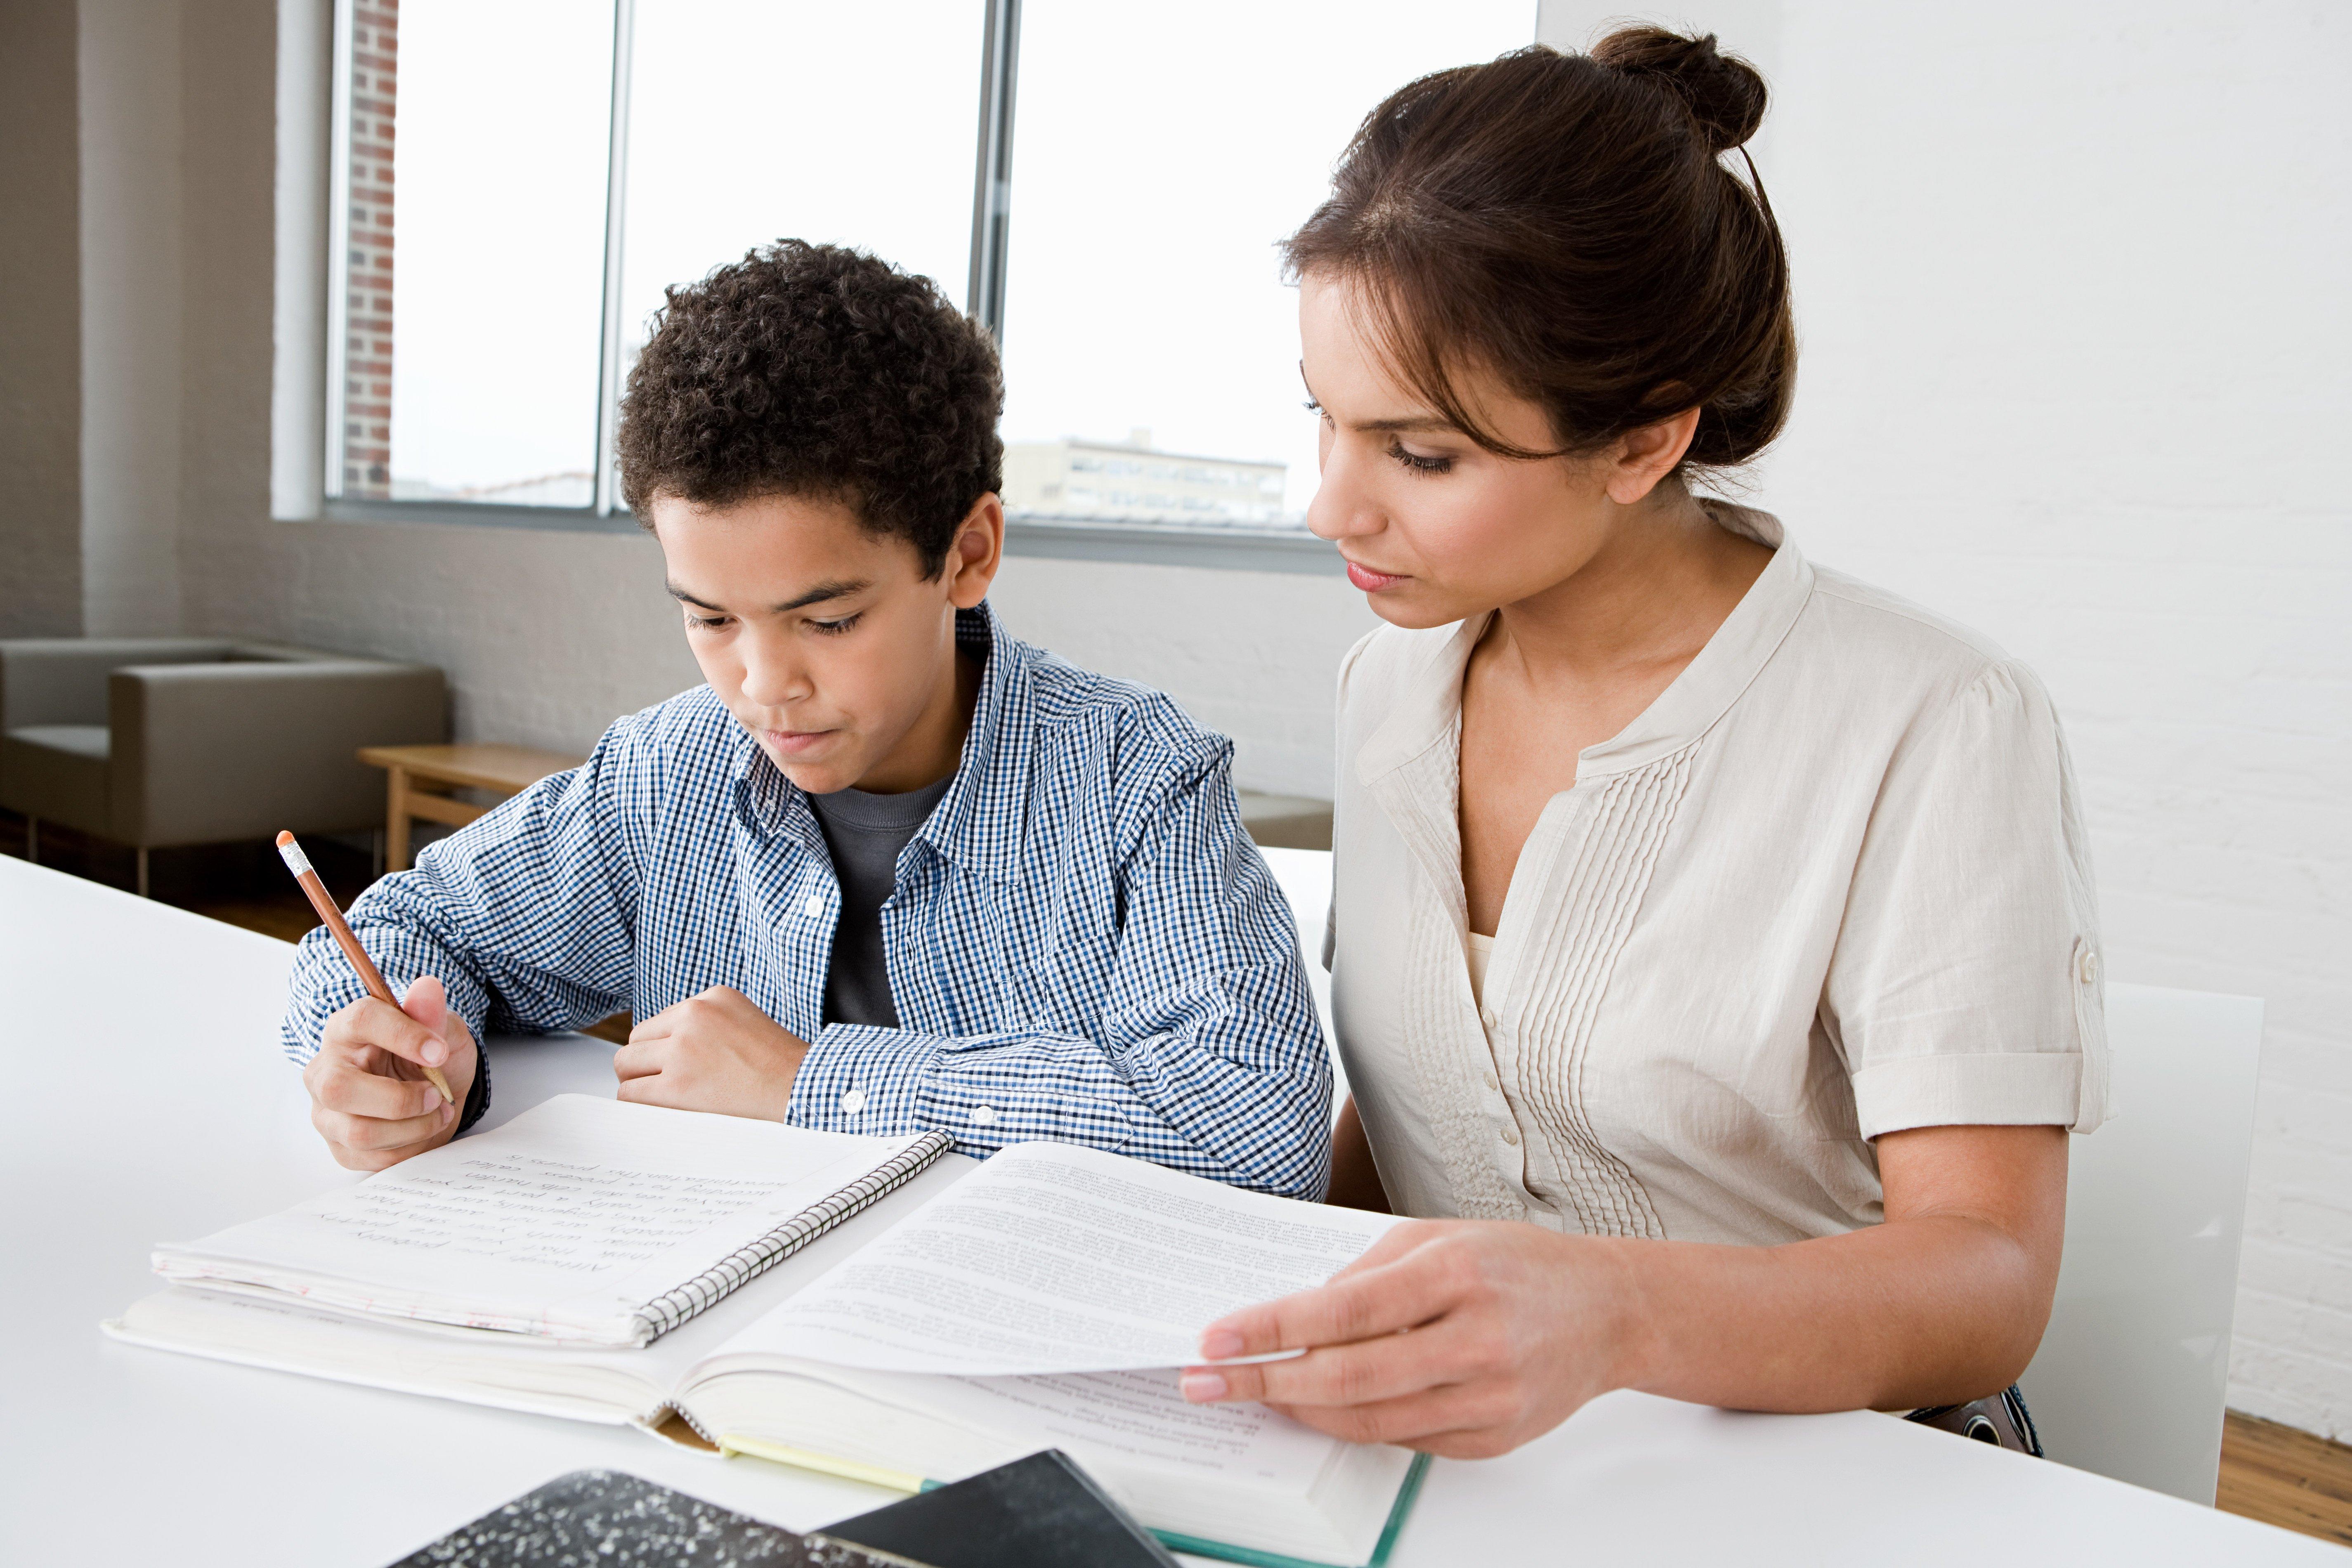 tutor monitoring the student